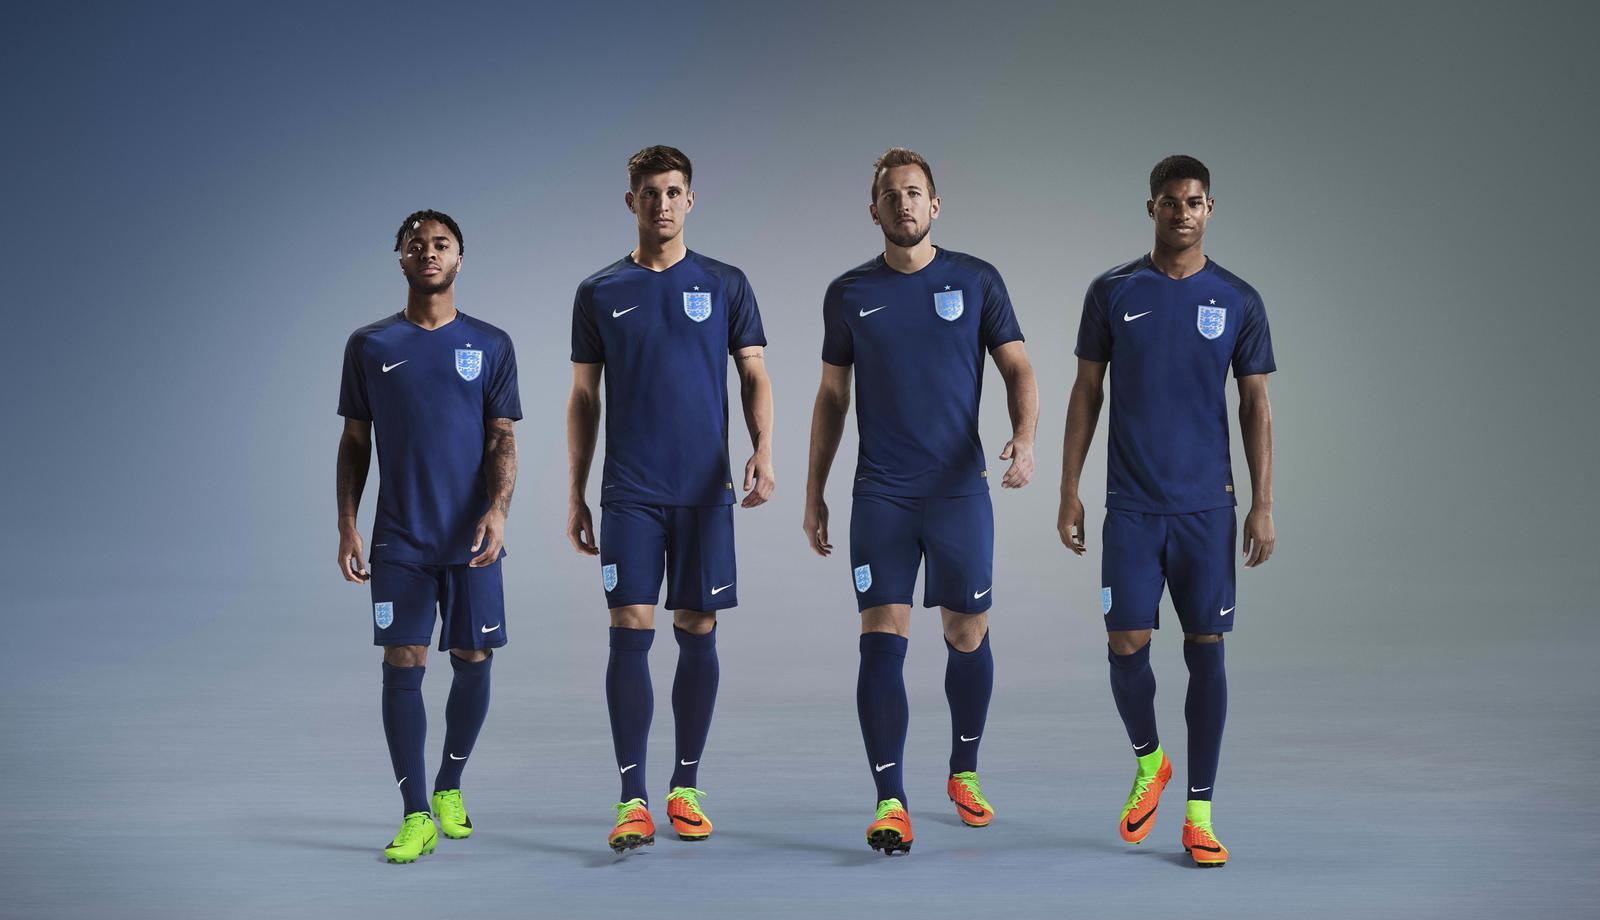 nike-england-2017-away-kit-banner